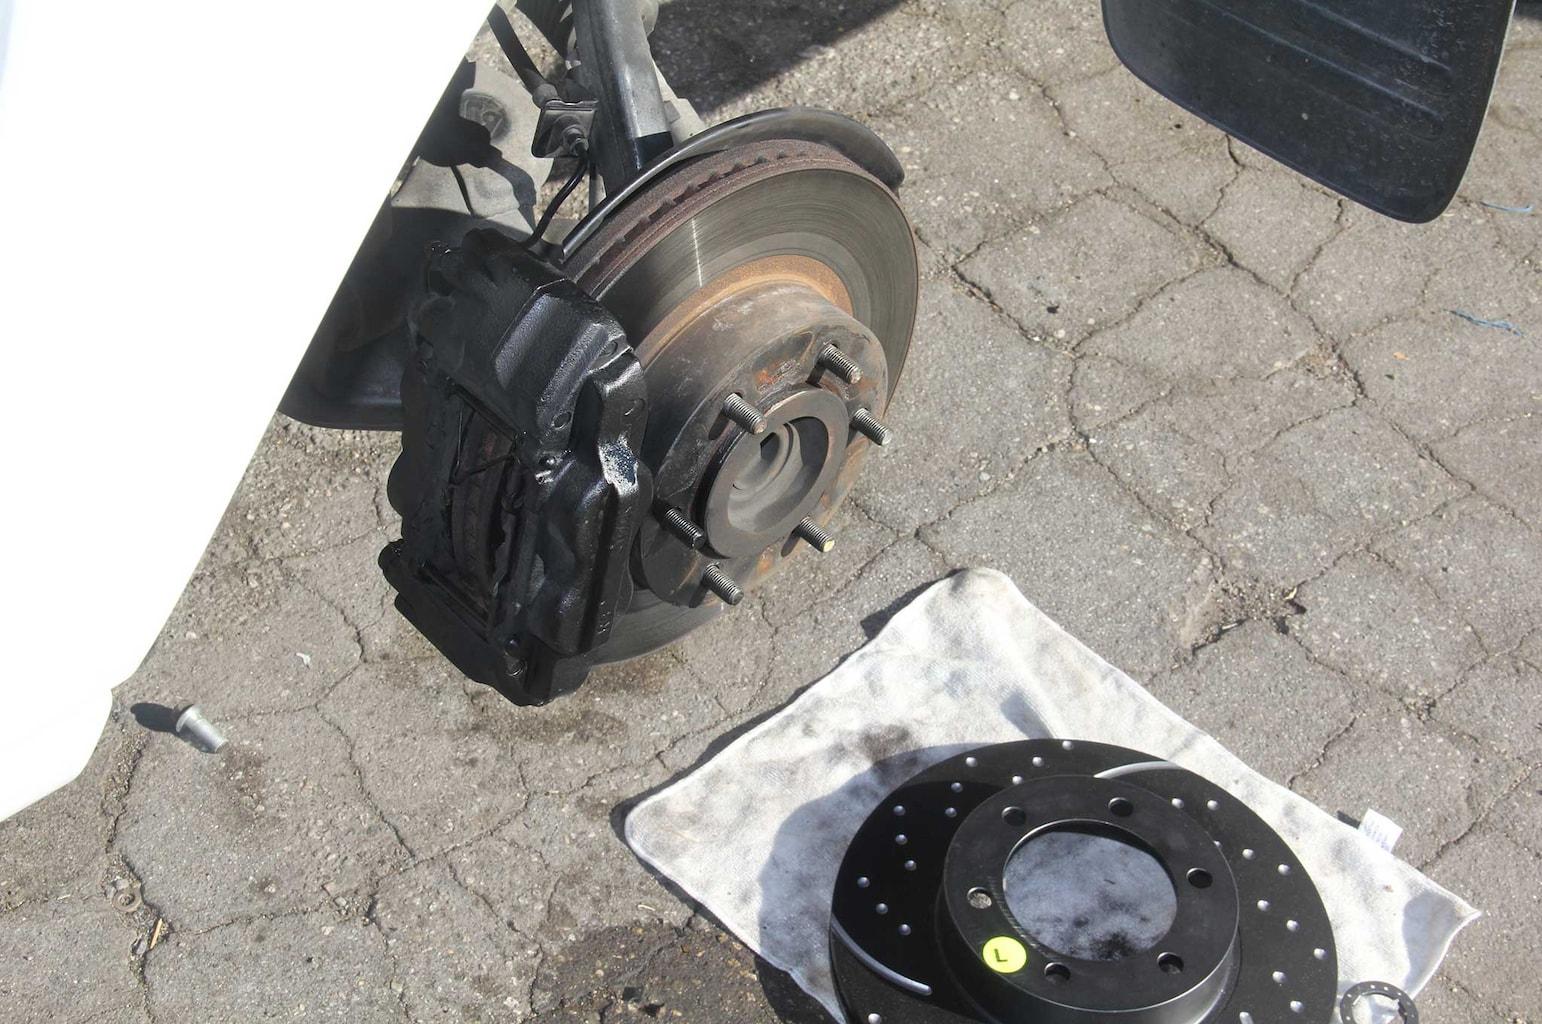 ebc brakes gd rotor and truck pad install caliper pin loosening 002